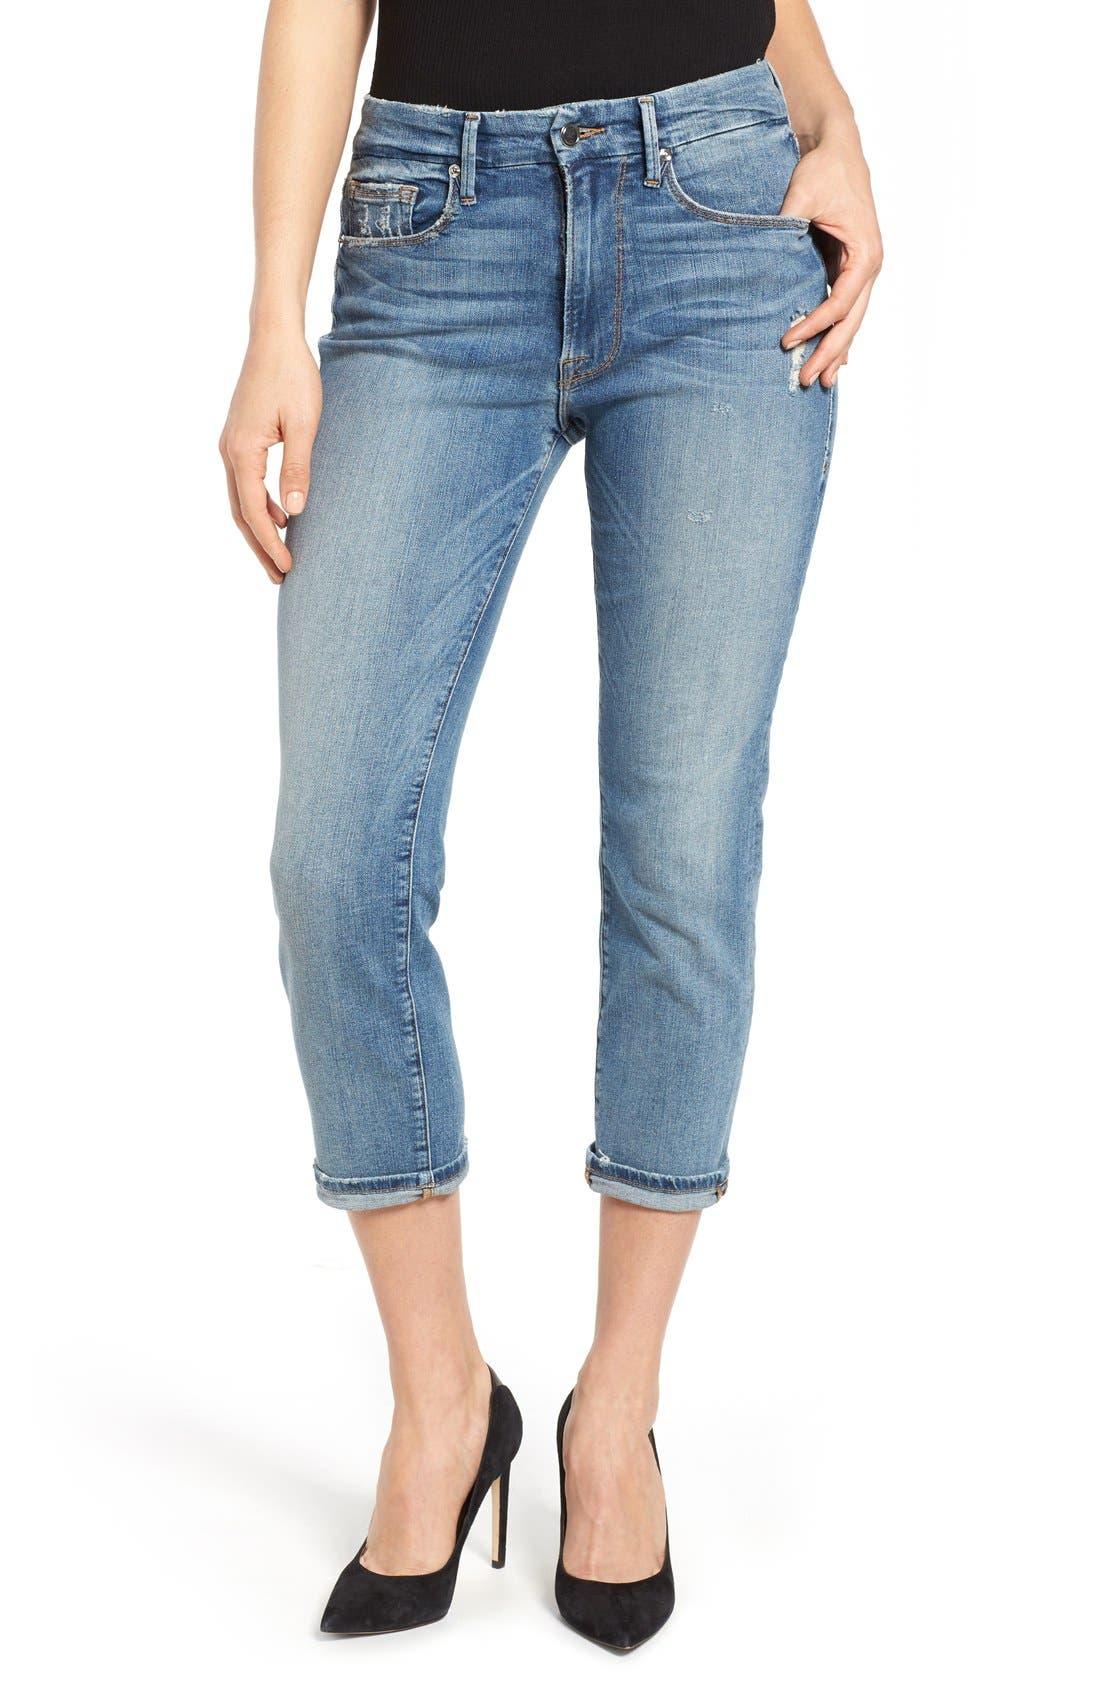 Main Image - Good American Good Cuts High Rise Boyfriend Jeans